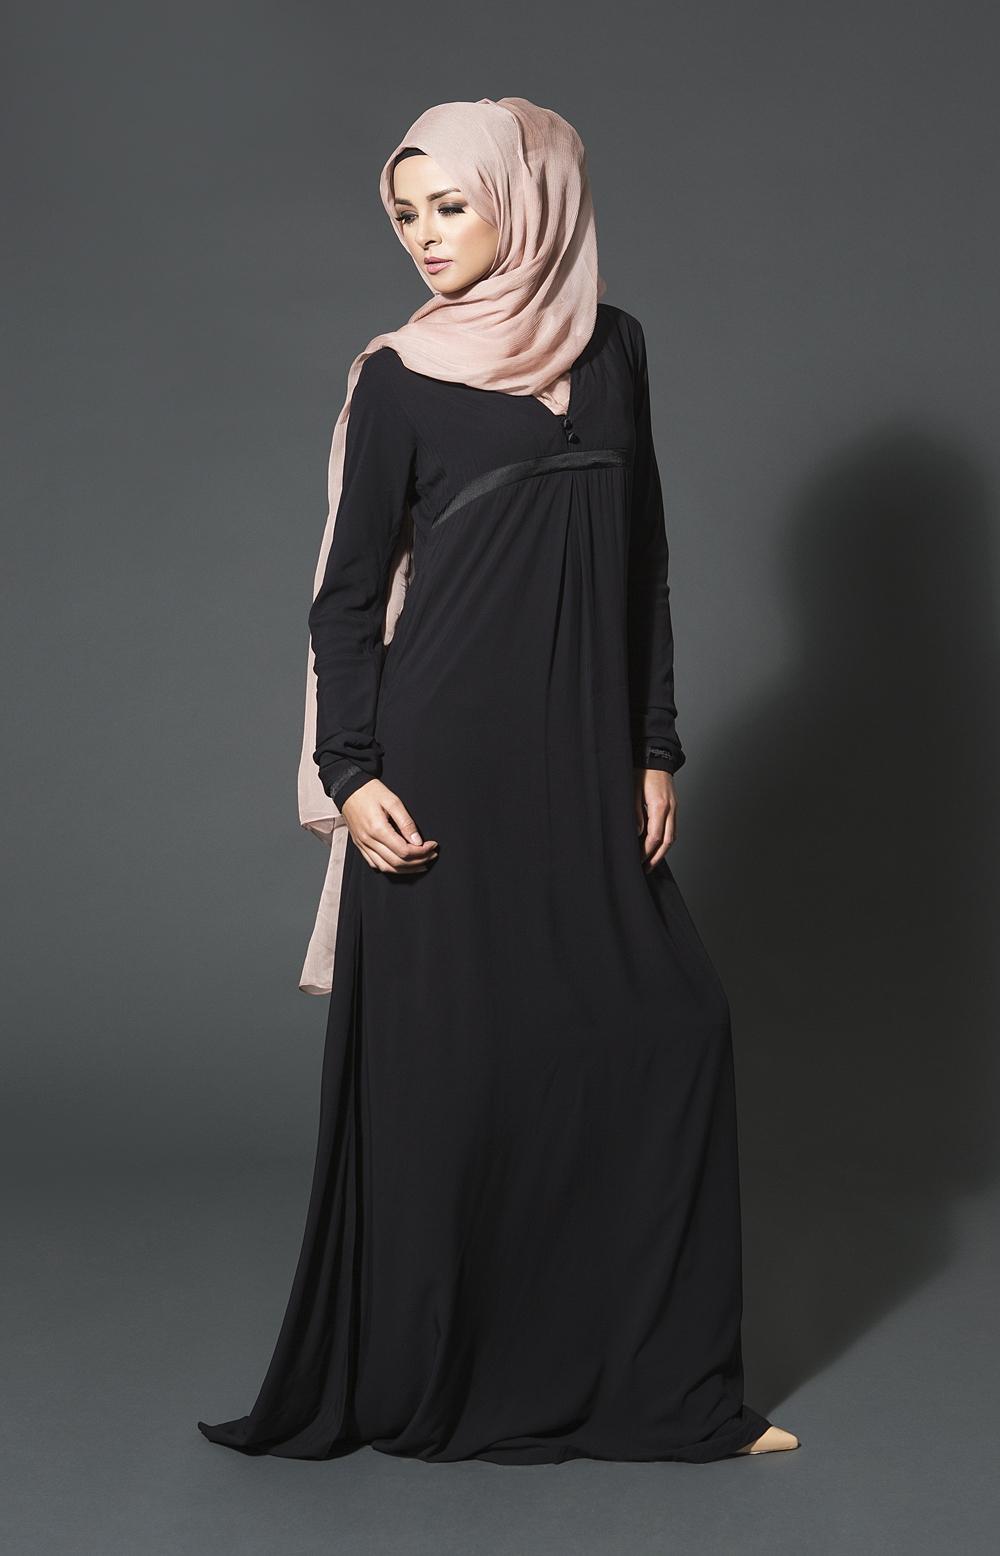 gambar model abaya